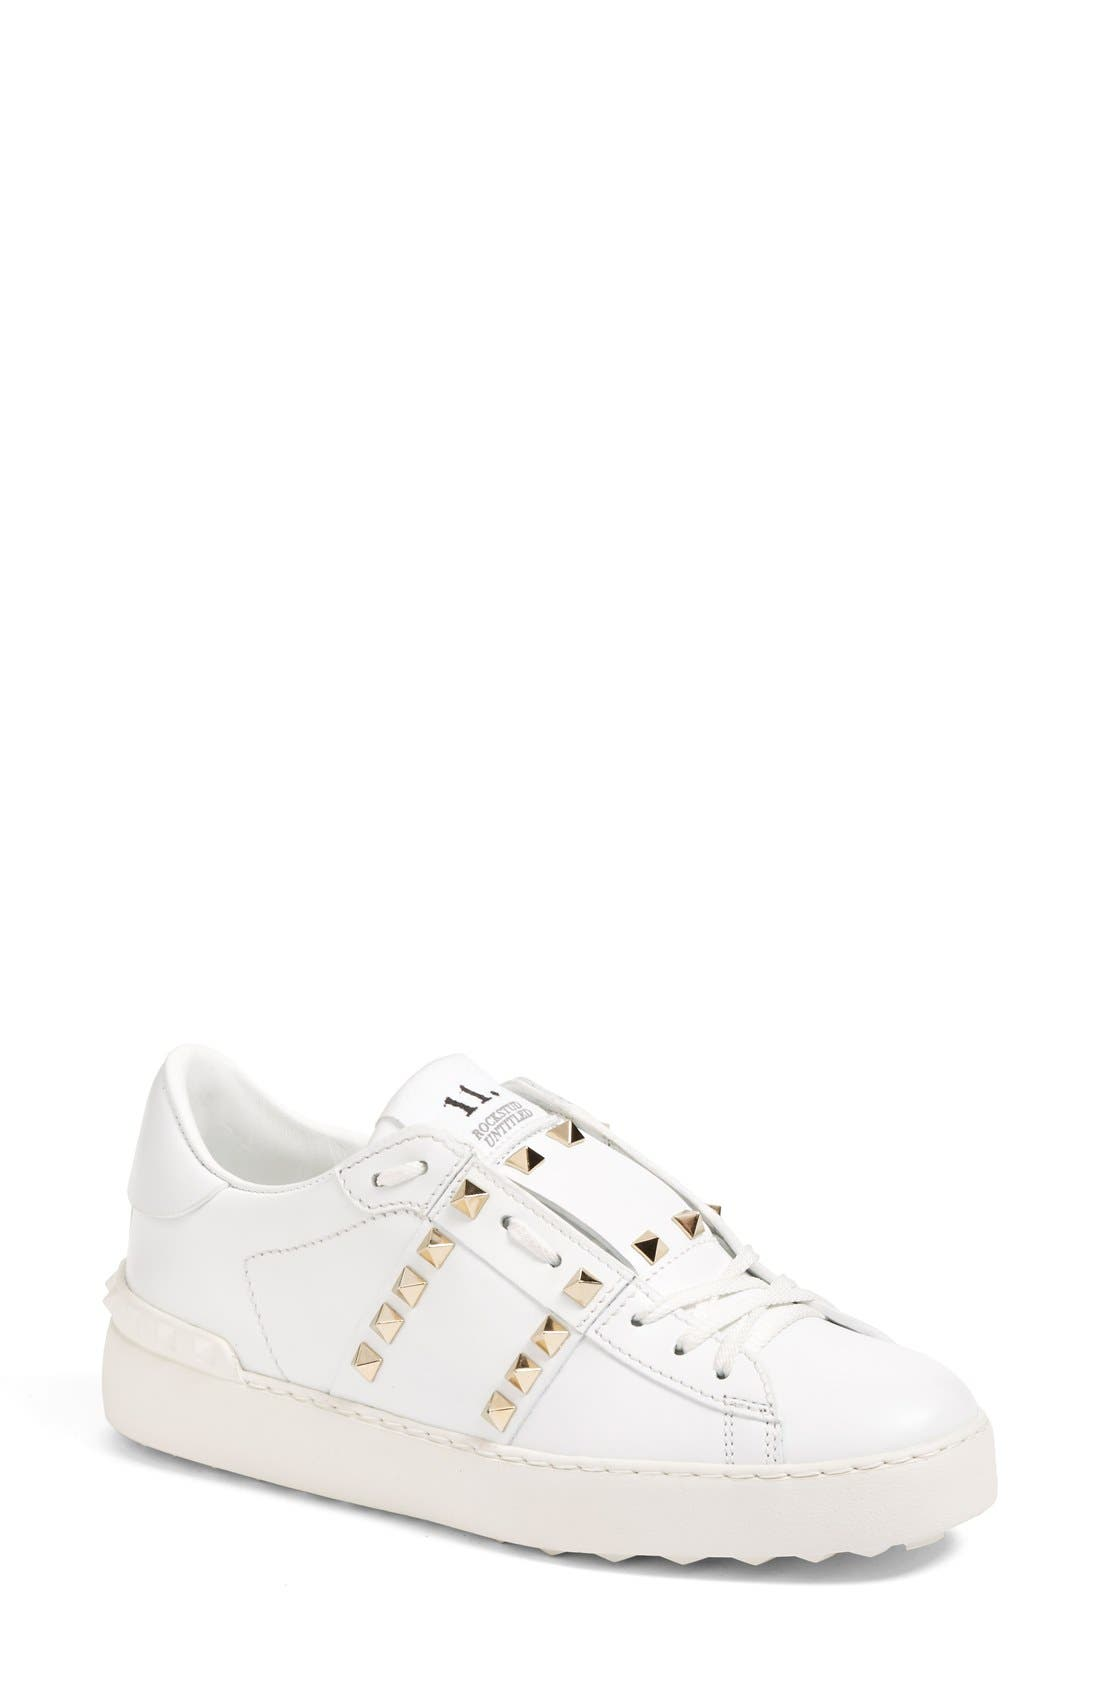 VALENTINO GARAVANI 'Rockstud' Sneaker